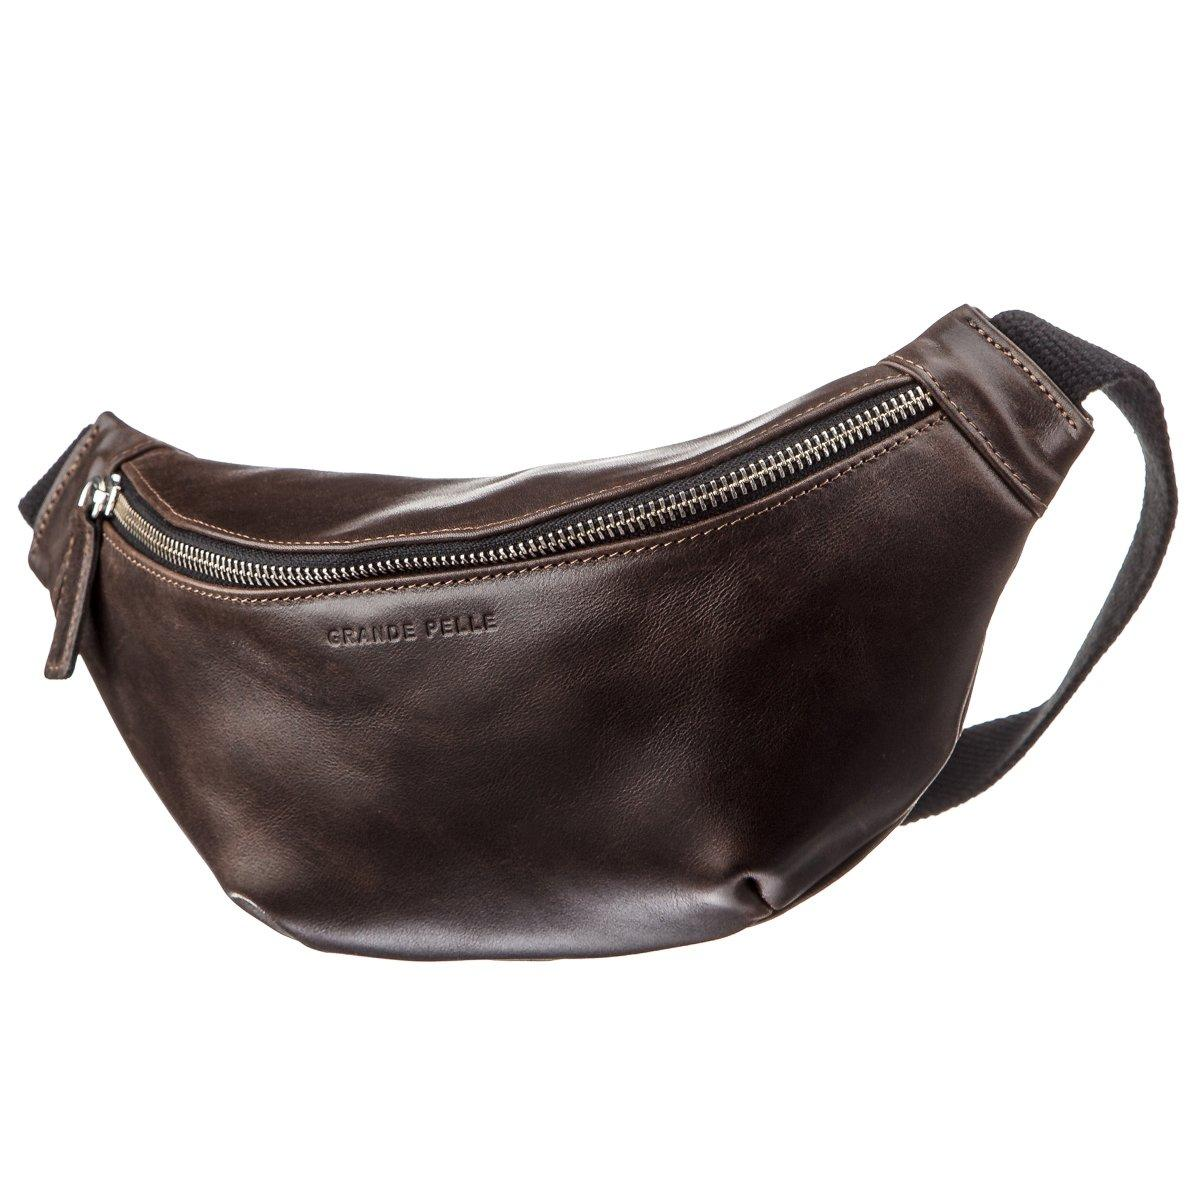 Поясная сумка GRANDE PELLE 11143 Темно-коричневая